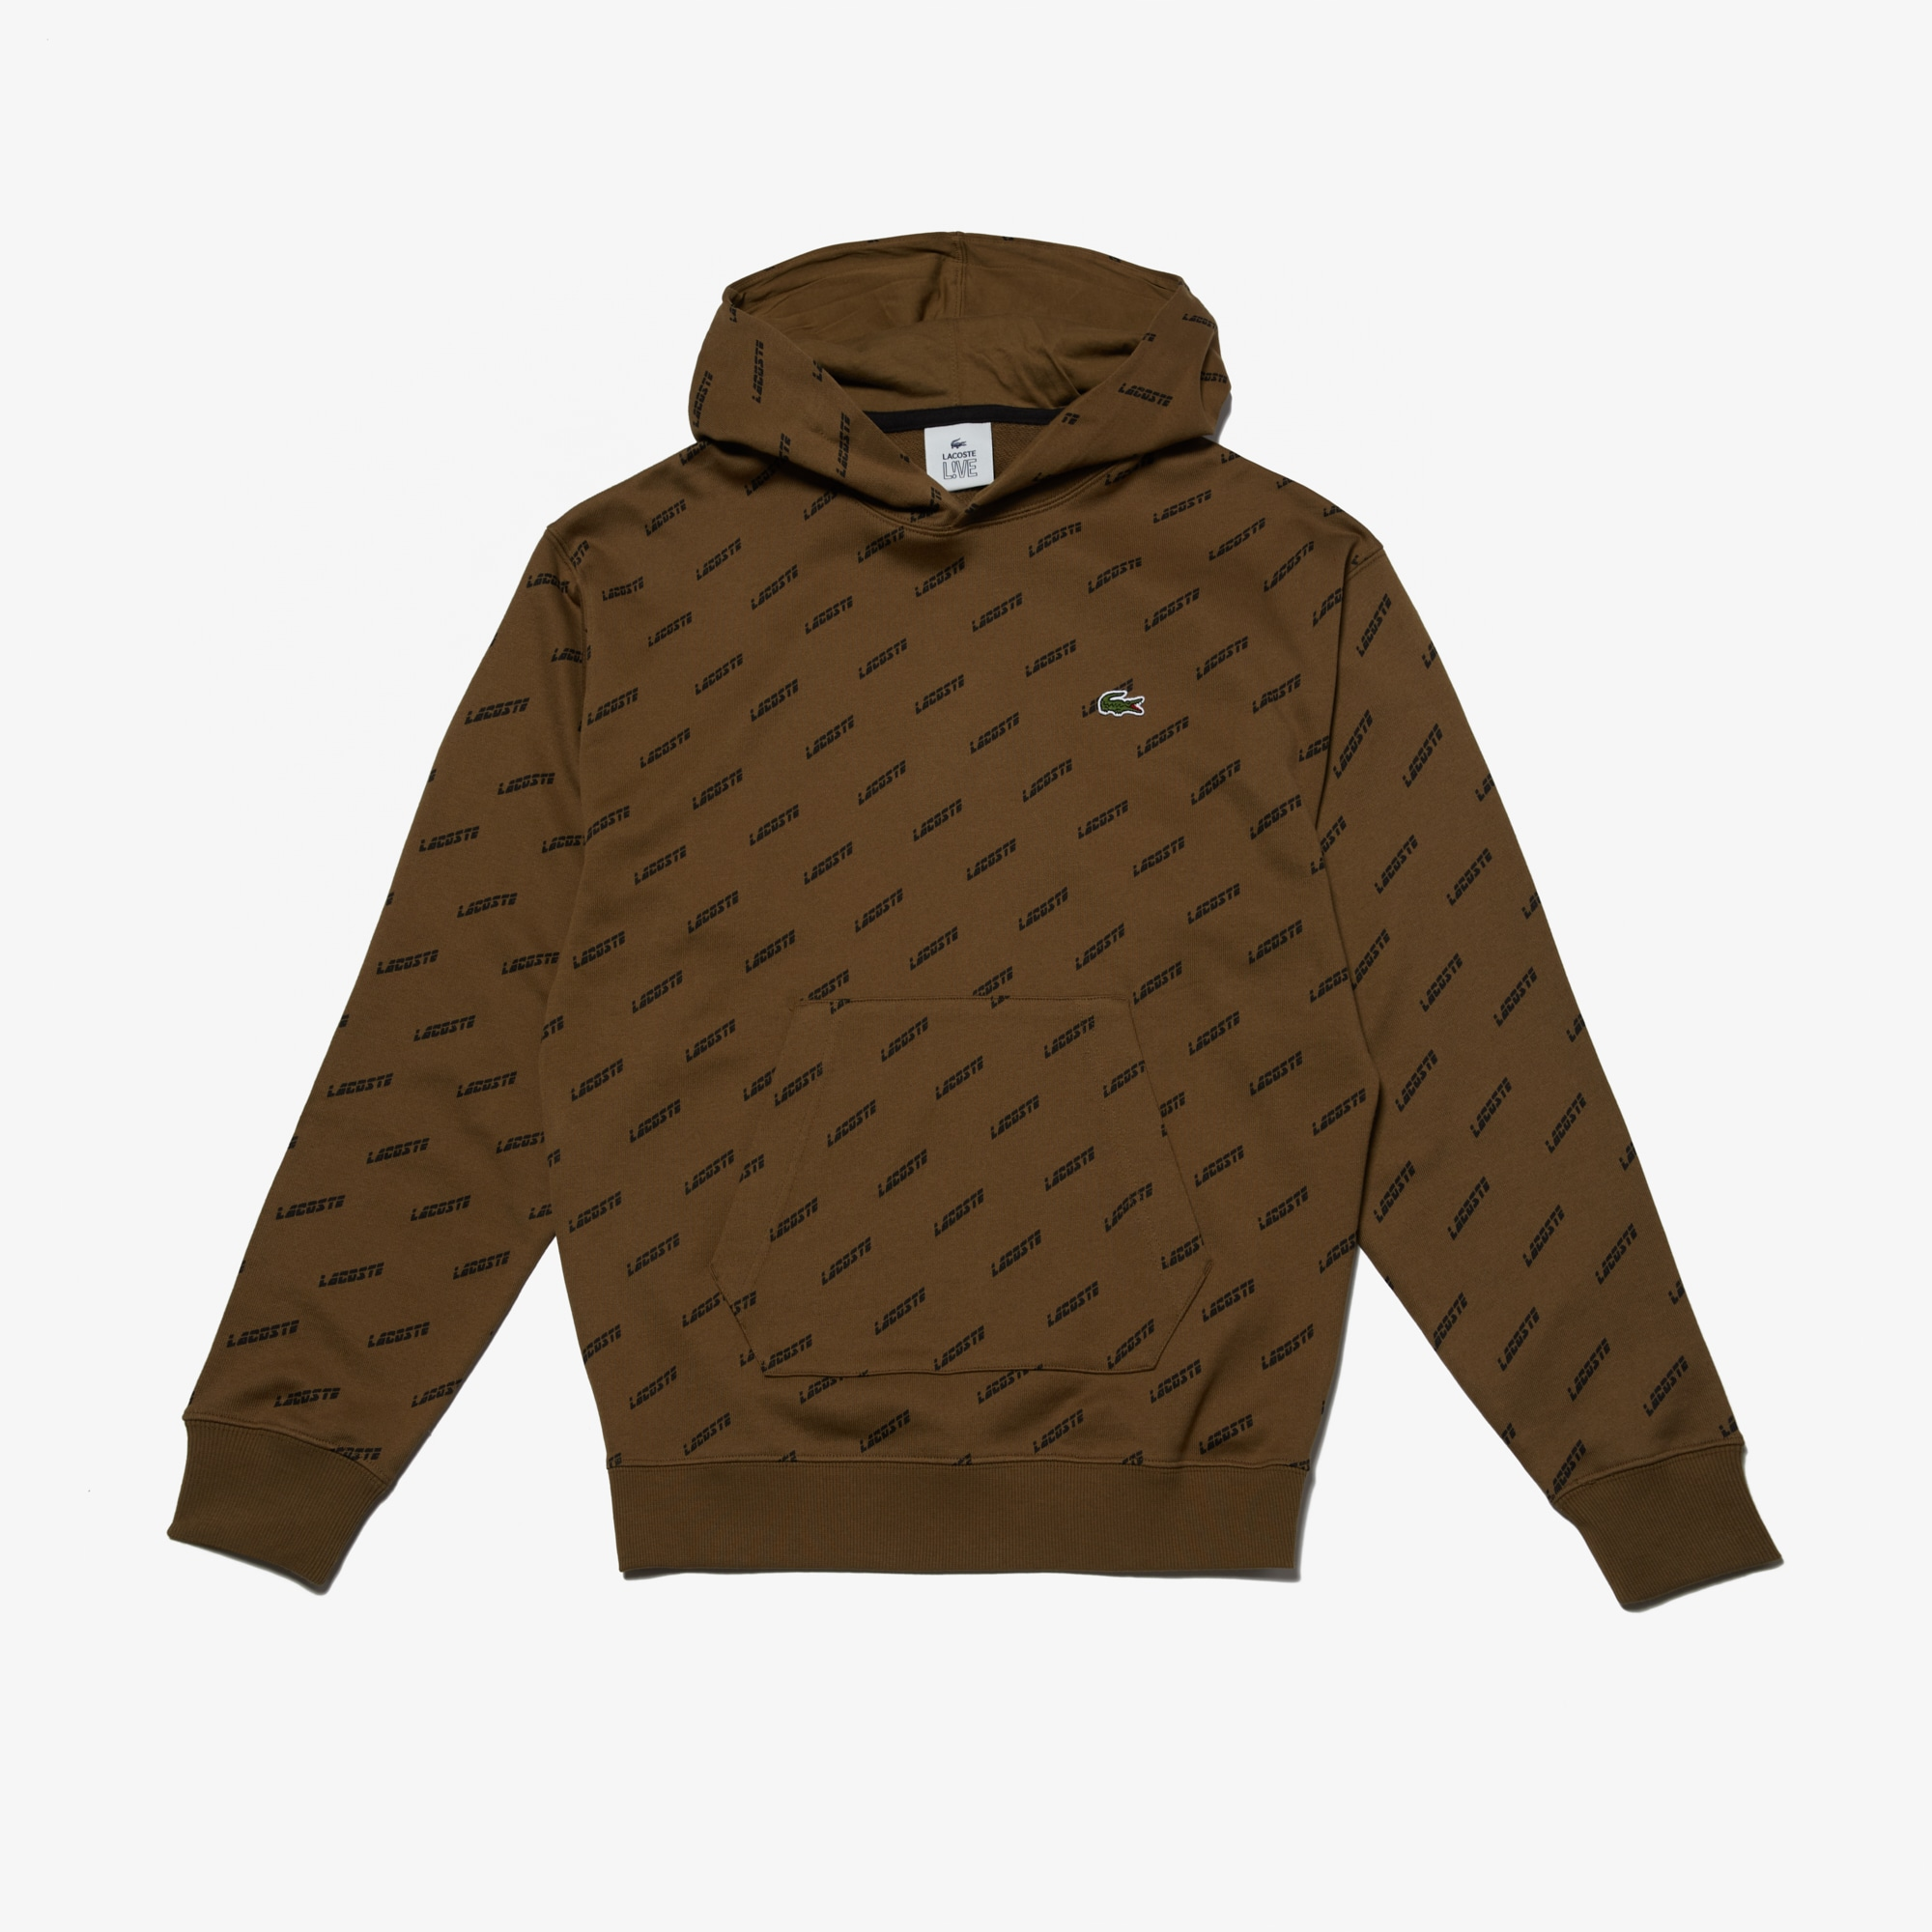 2219c04e3a97 Men s Sweatshirts